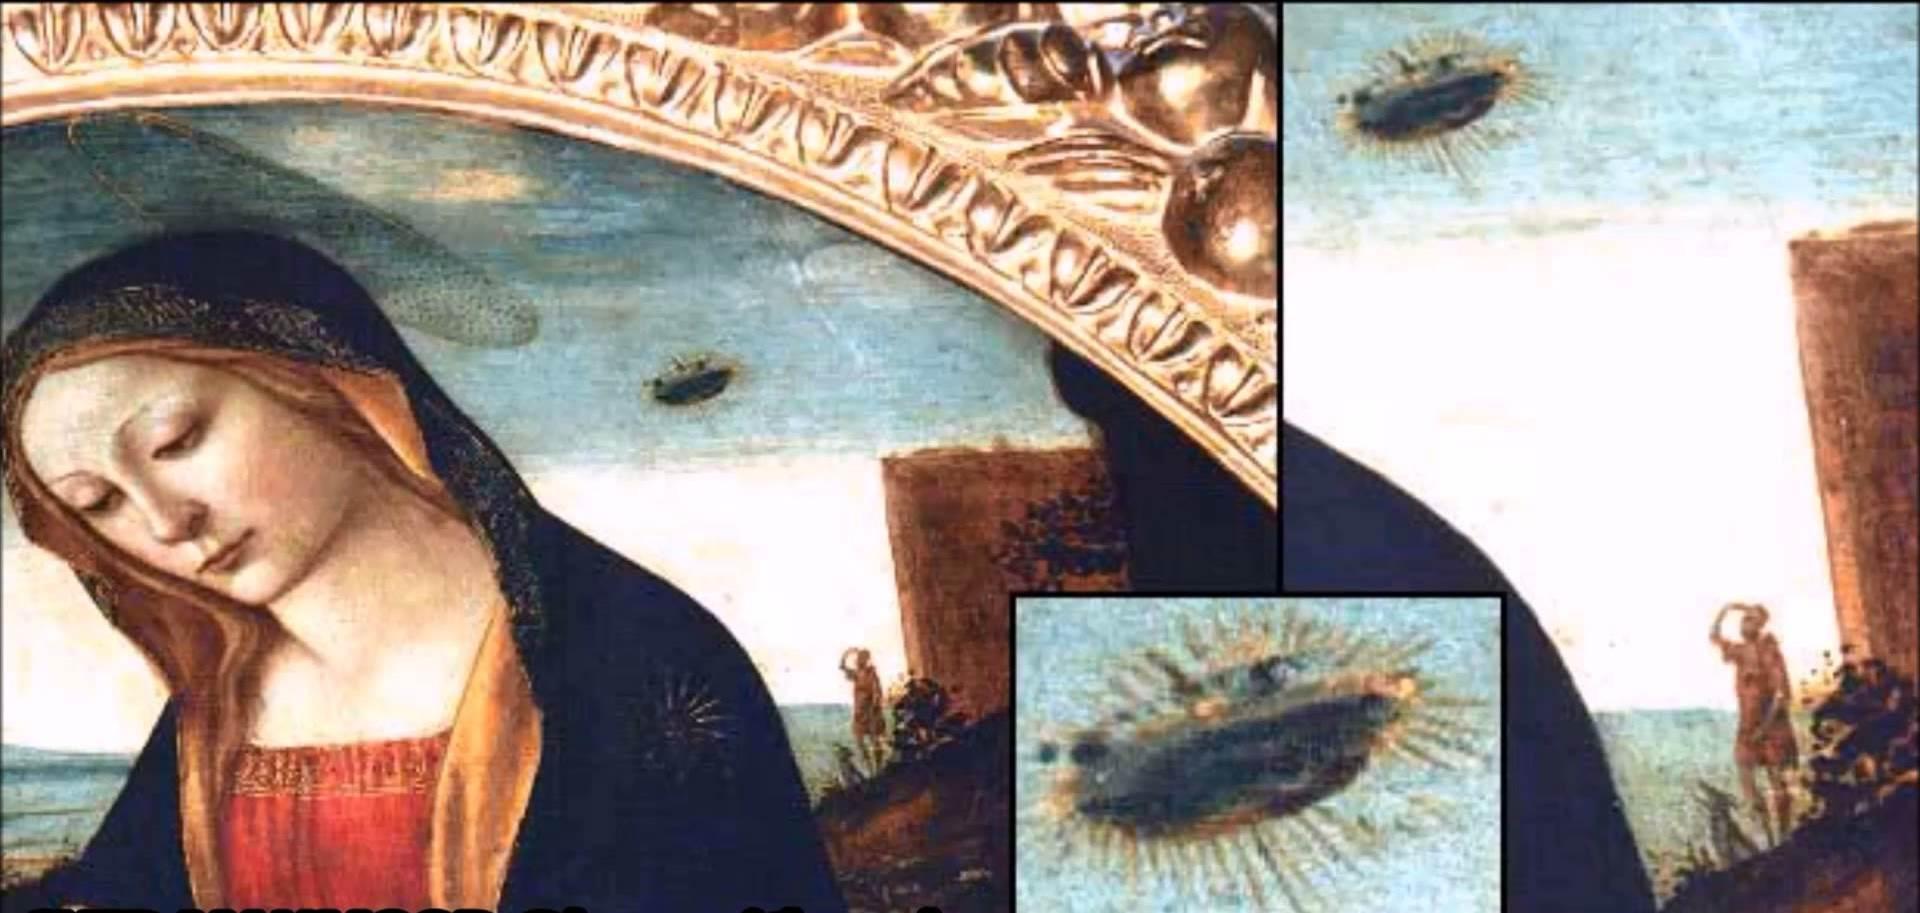 maxresdefault (2), UFO σε πίνακες της Αναγέννησης και του Μεσαίωνα